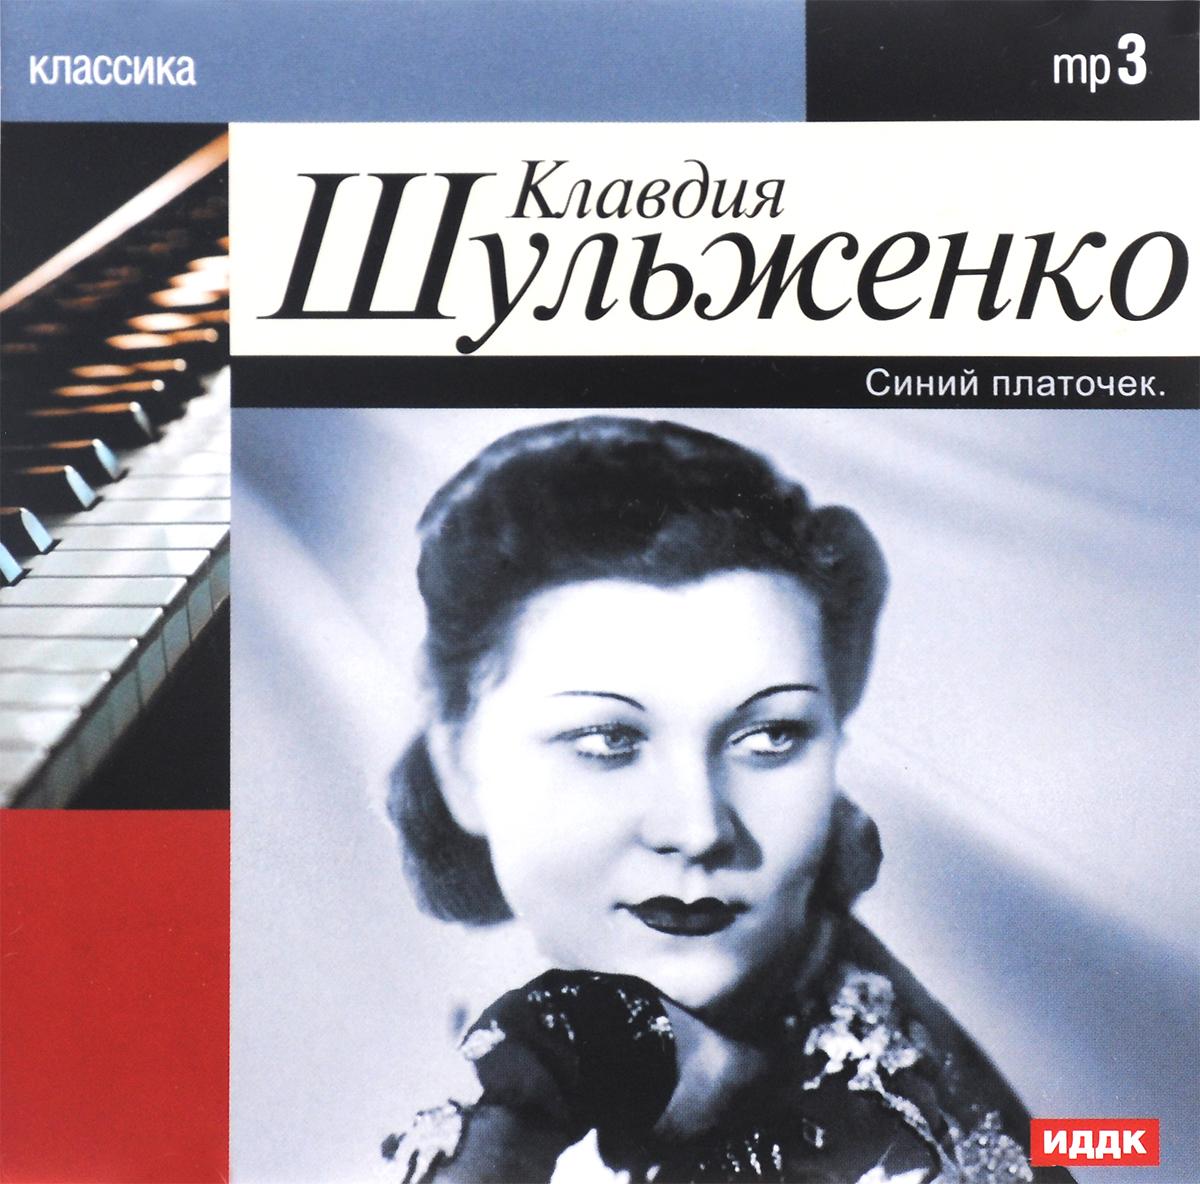 Zakazat.ru Классика. Клавдия Шульженко. Синий платочек (mp3)